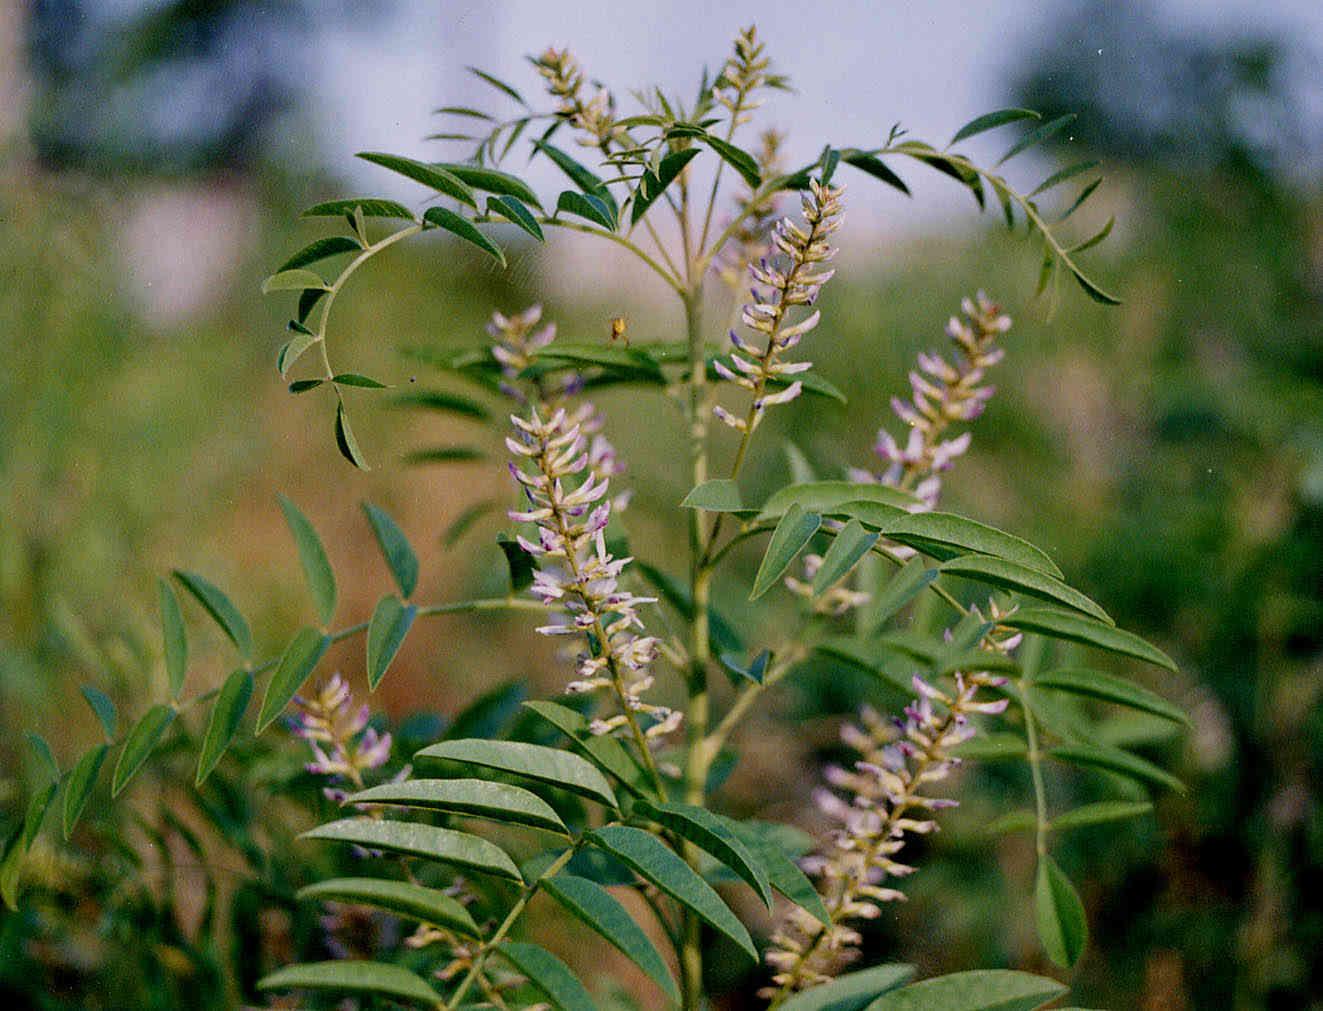 Cây cam thảo Bắc (Glycyrrhiza uralensis)